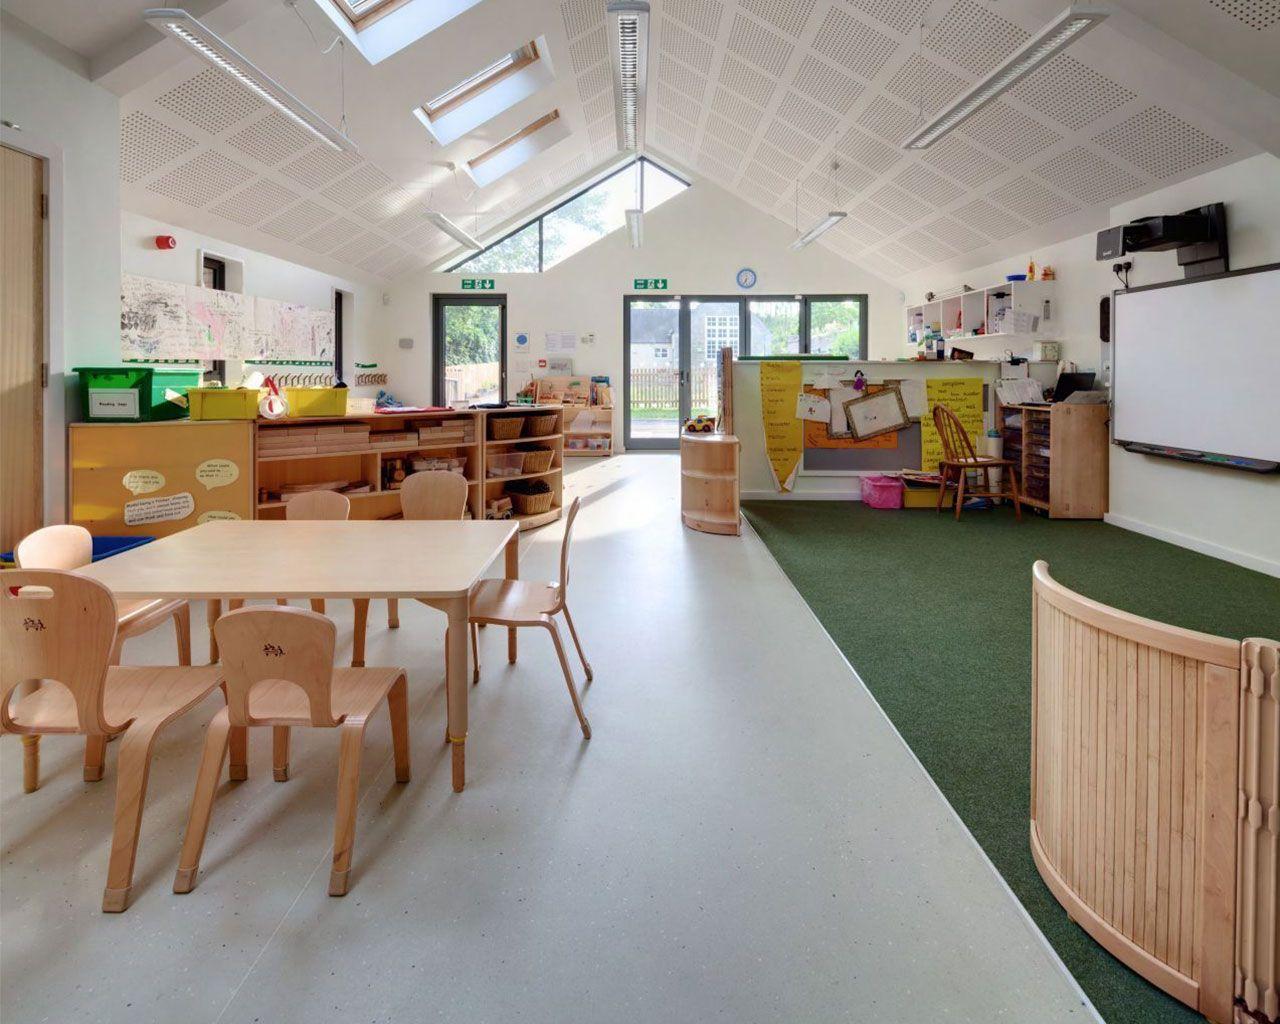 Interior Design Schools Fascinating Interior Design School With Cupboard